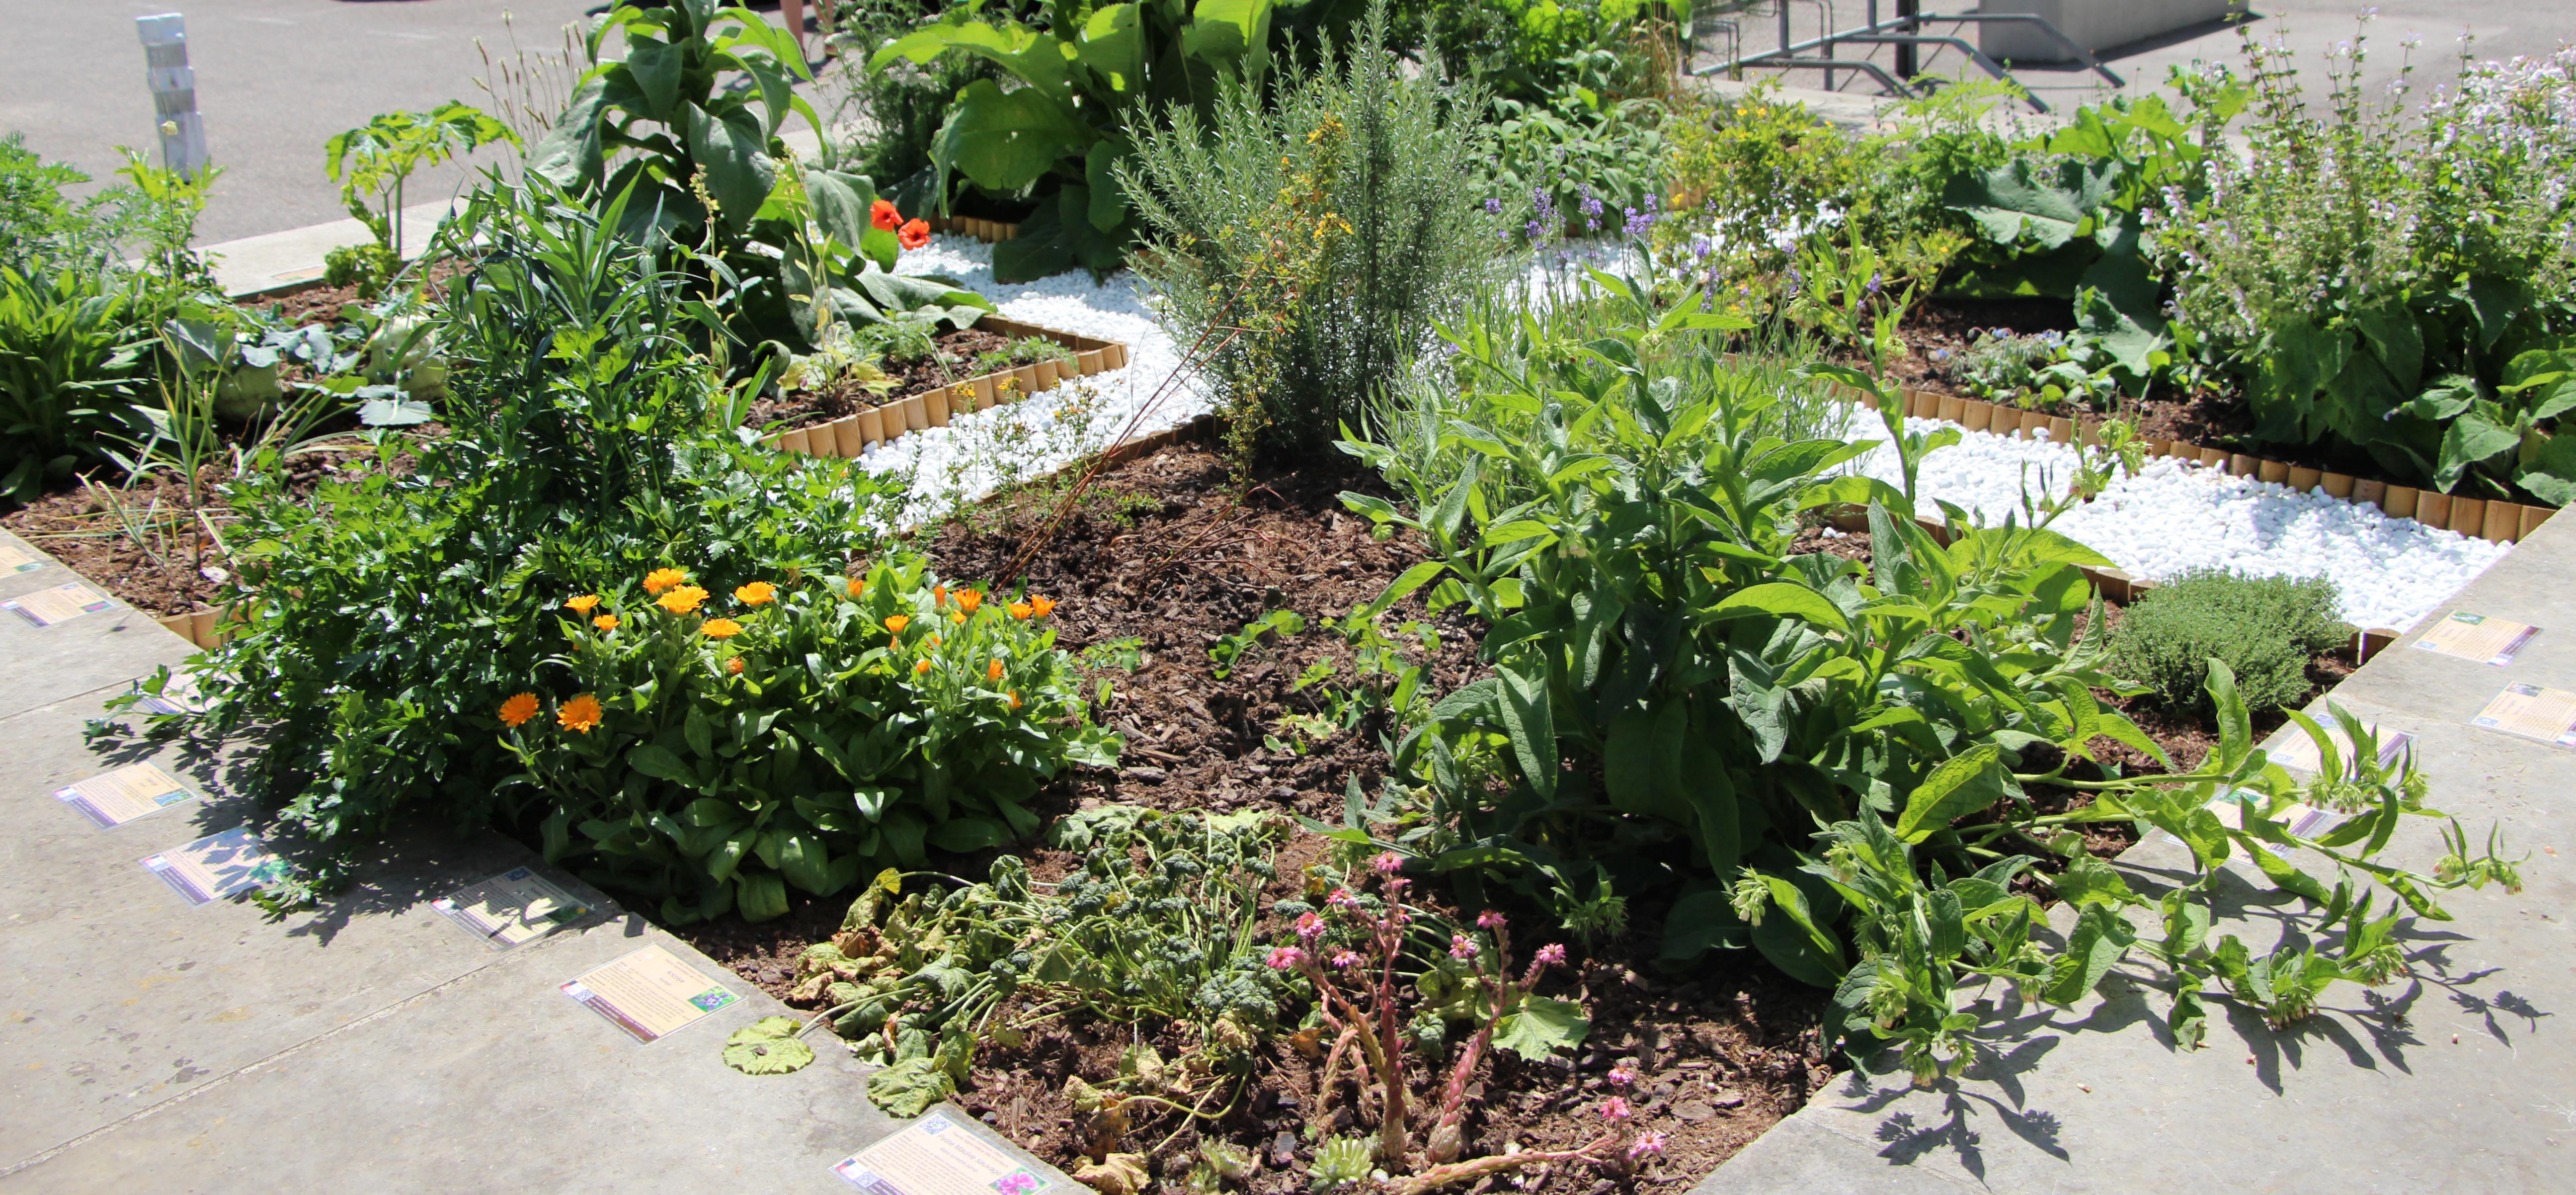 Vue du jardin médiéval des quatre humeurs - Jardin Dominique Villars - Juillet 2017